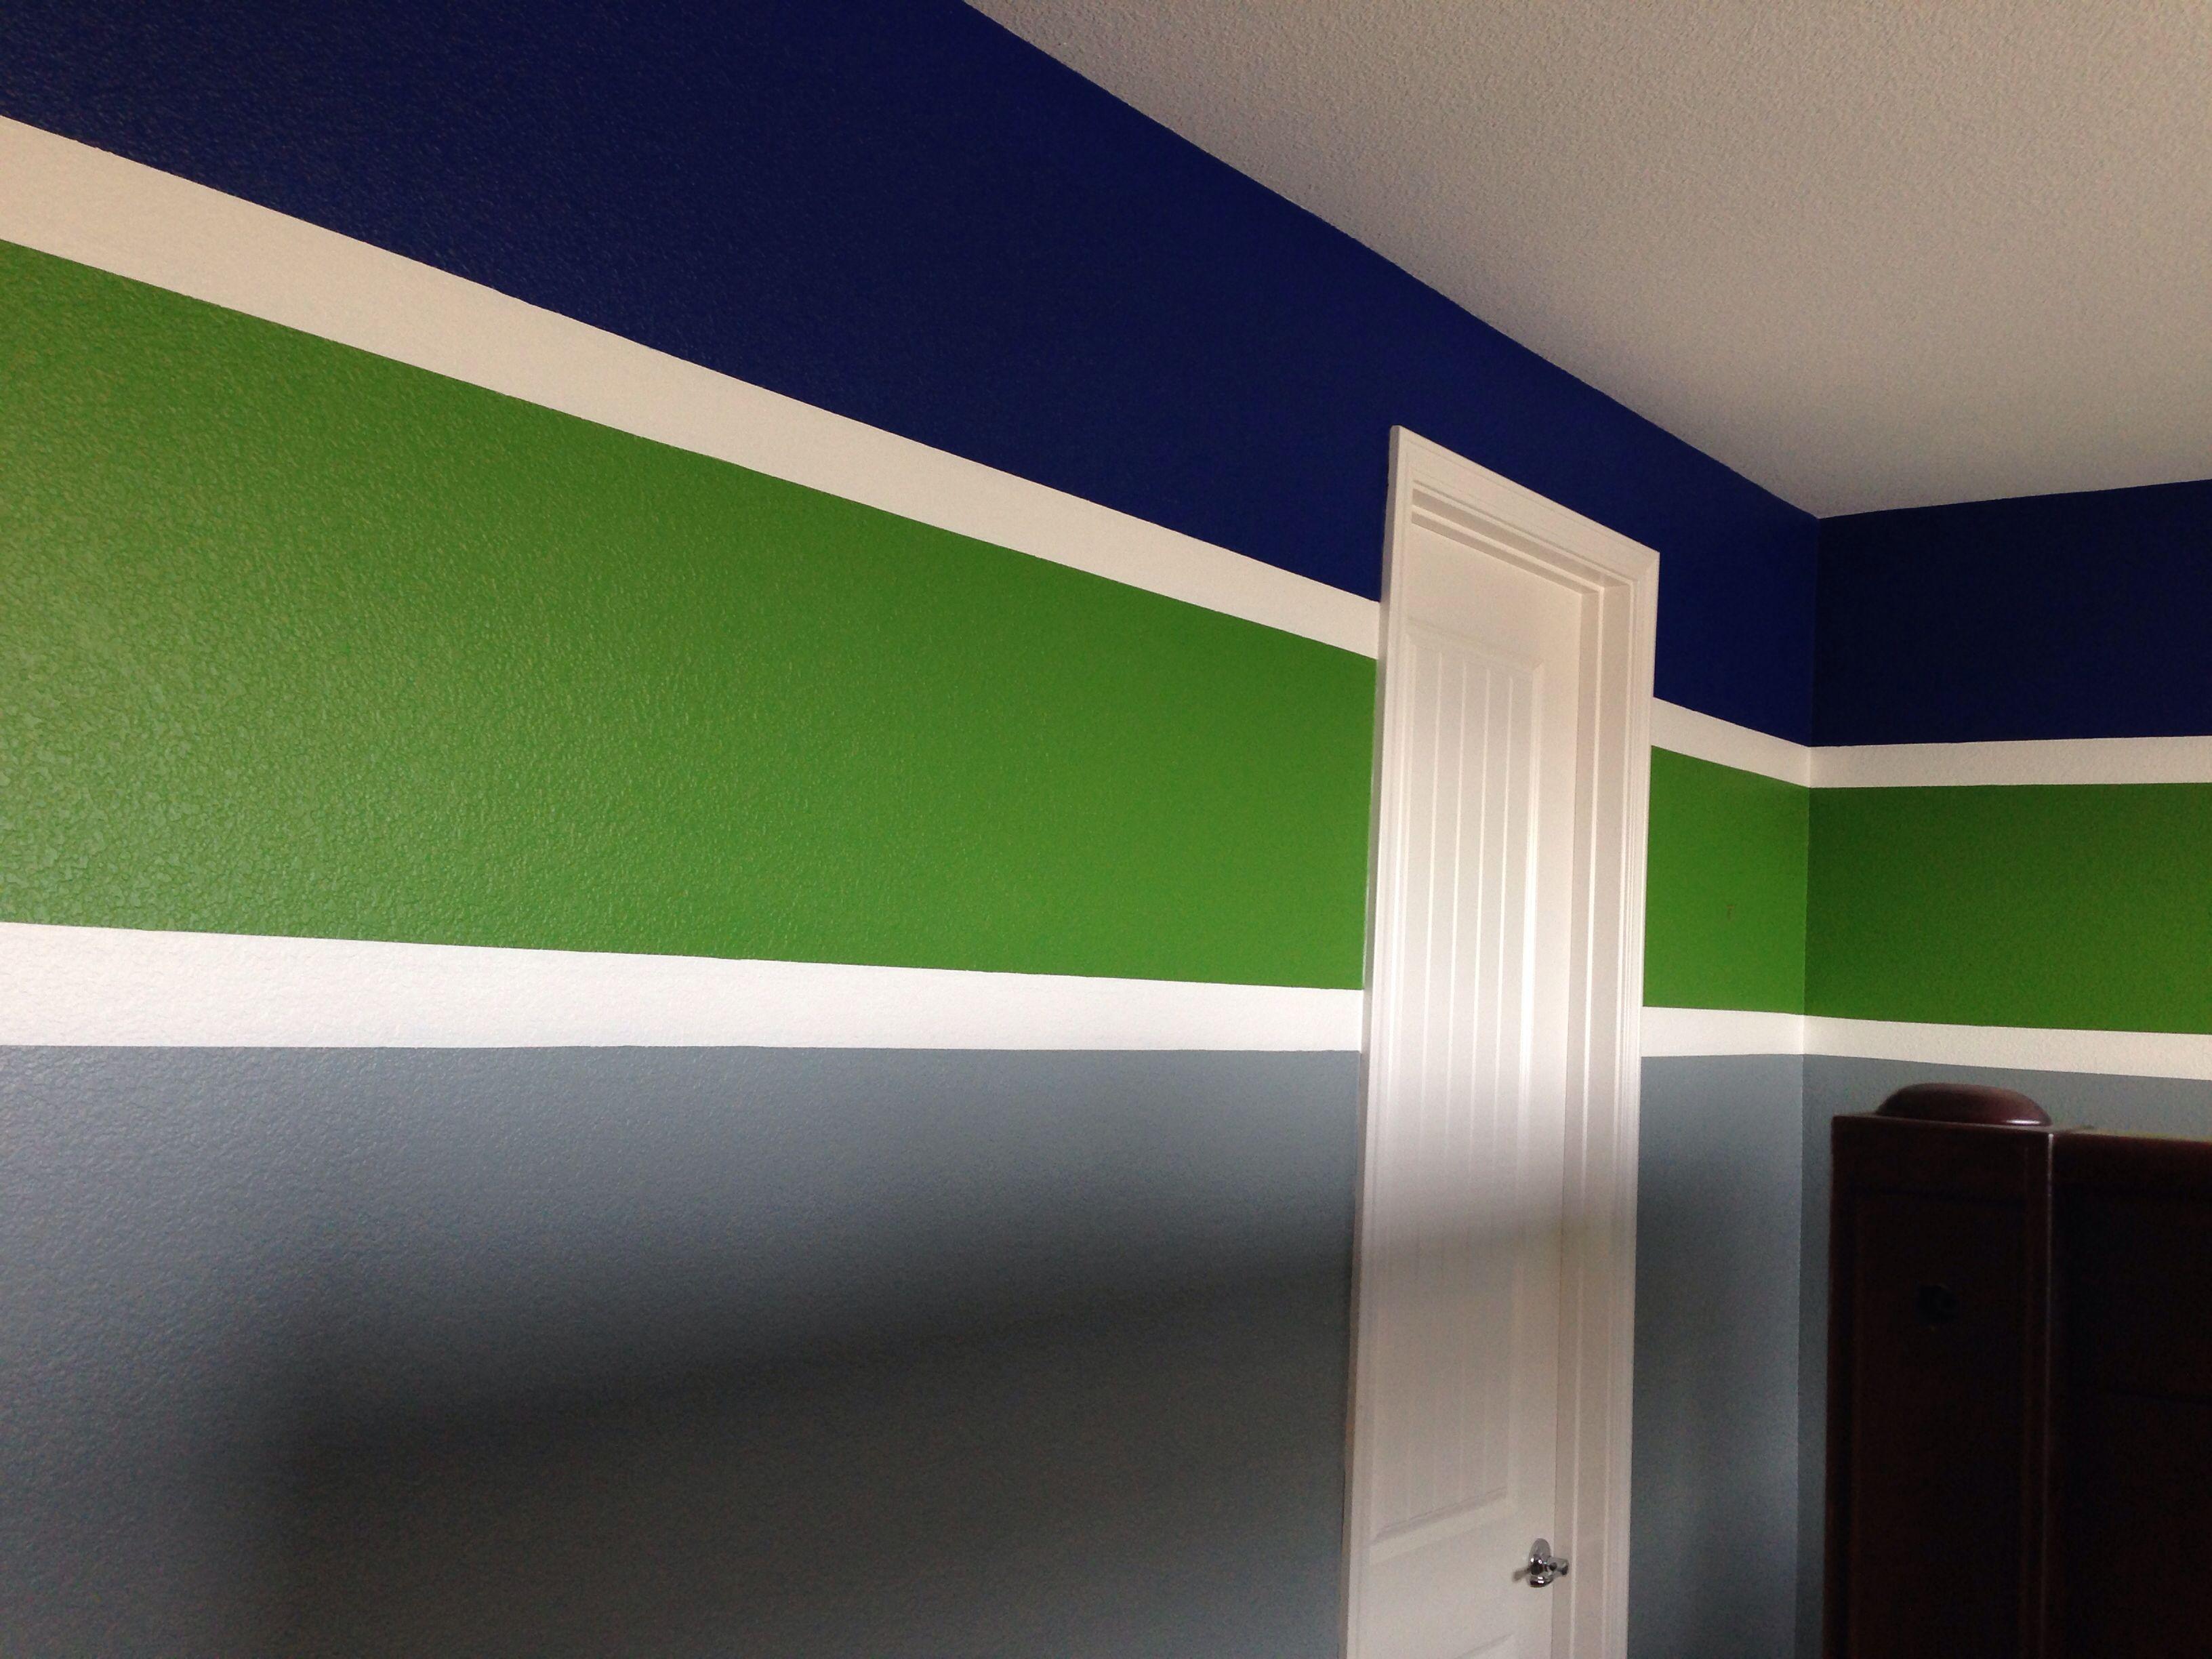 Boy room paint colors boys room pinterest - Paint color schemes for boys bedroom ...